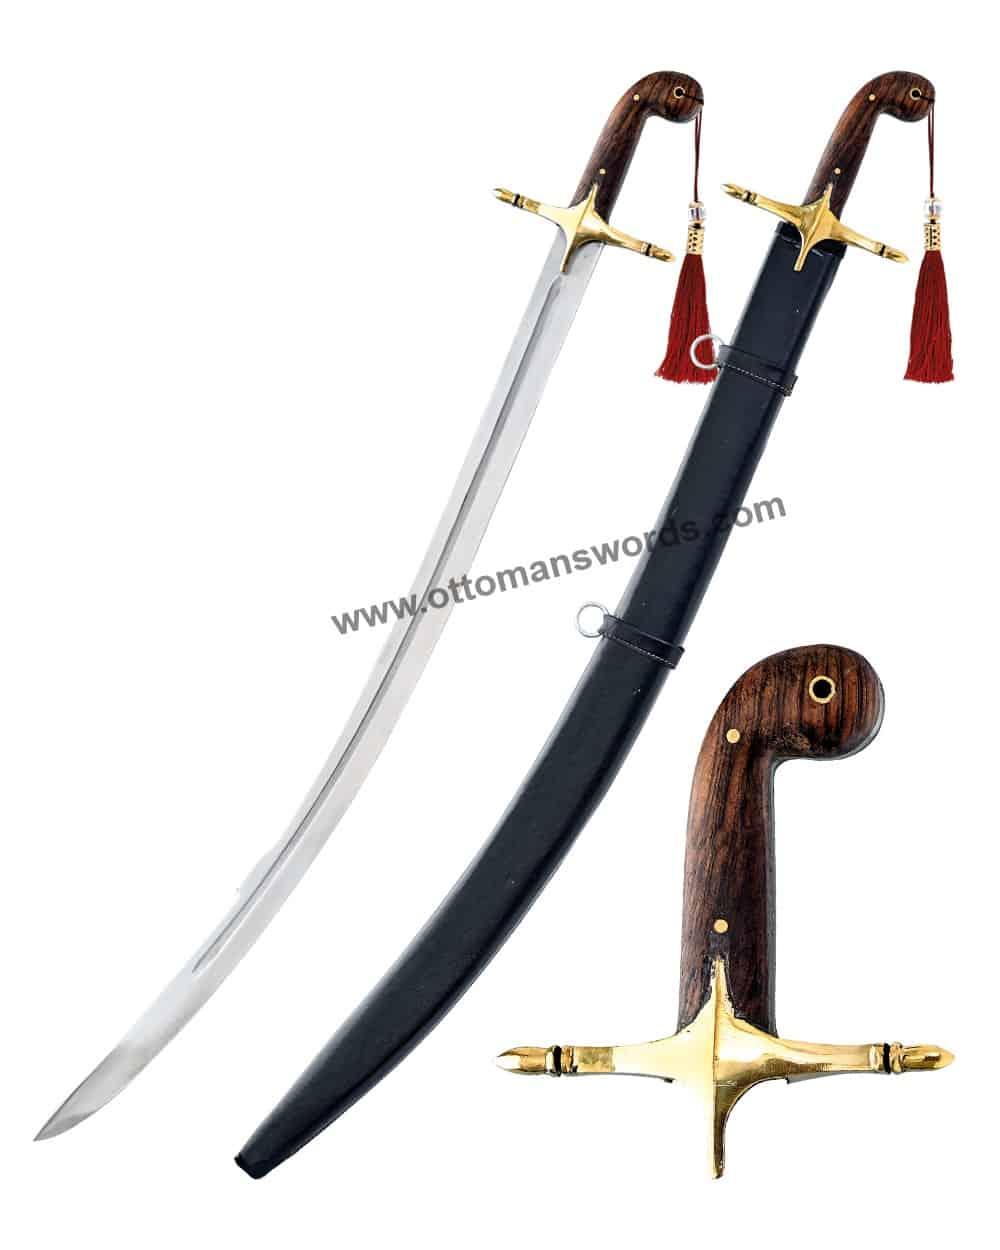 Ottoman Pala Swordbuy